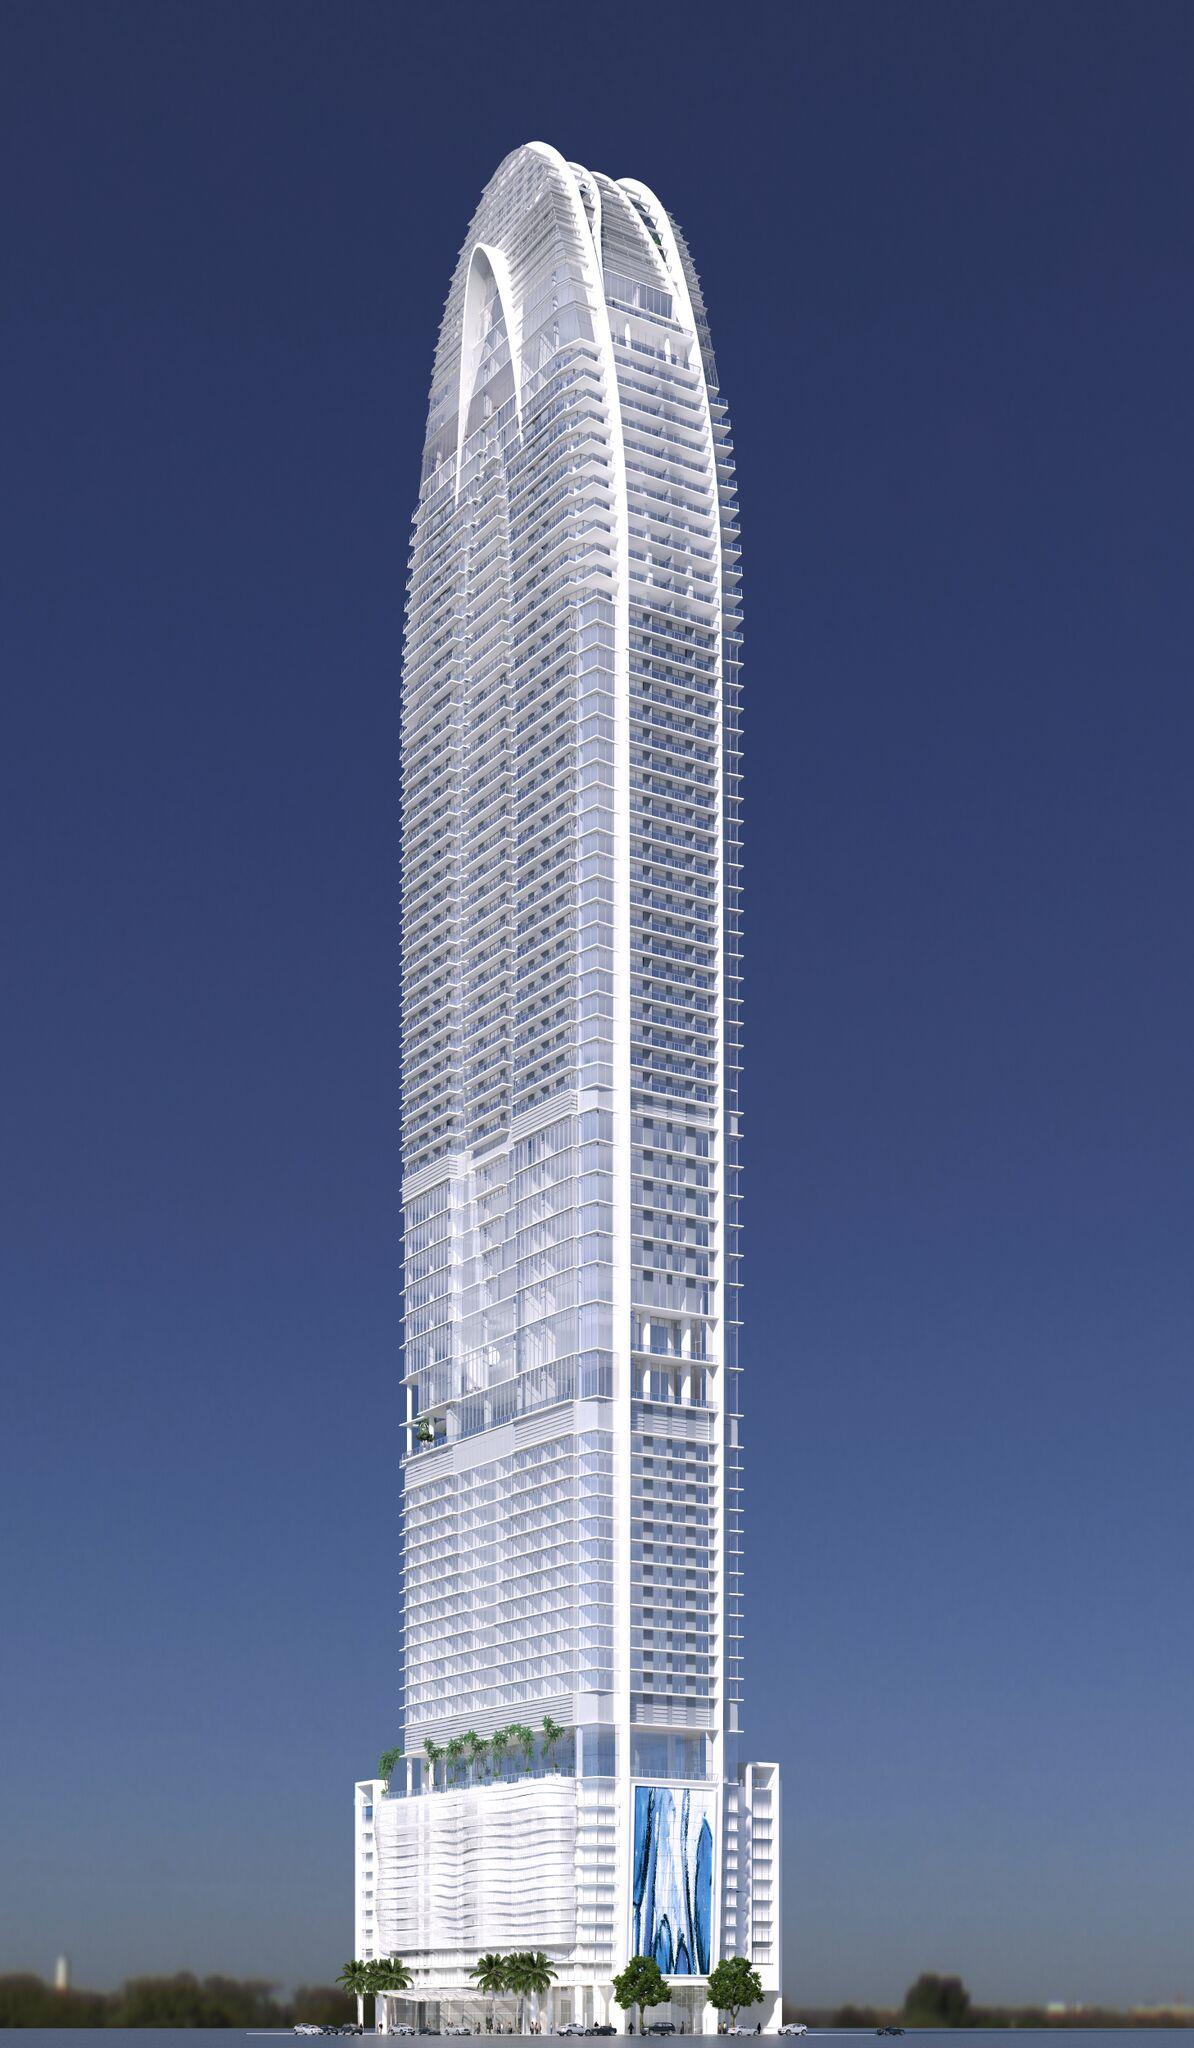 skyview image of OKAN Tower Miami